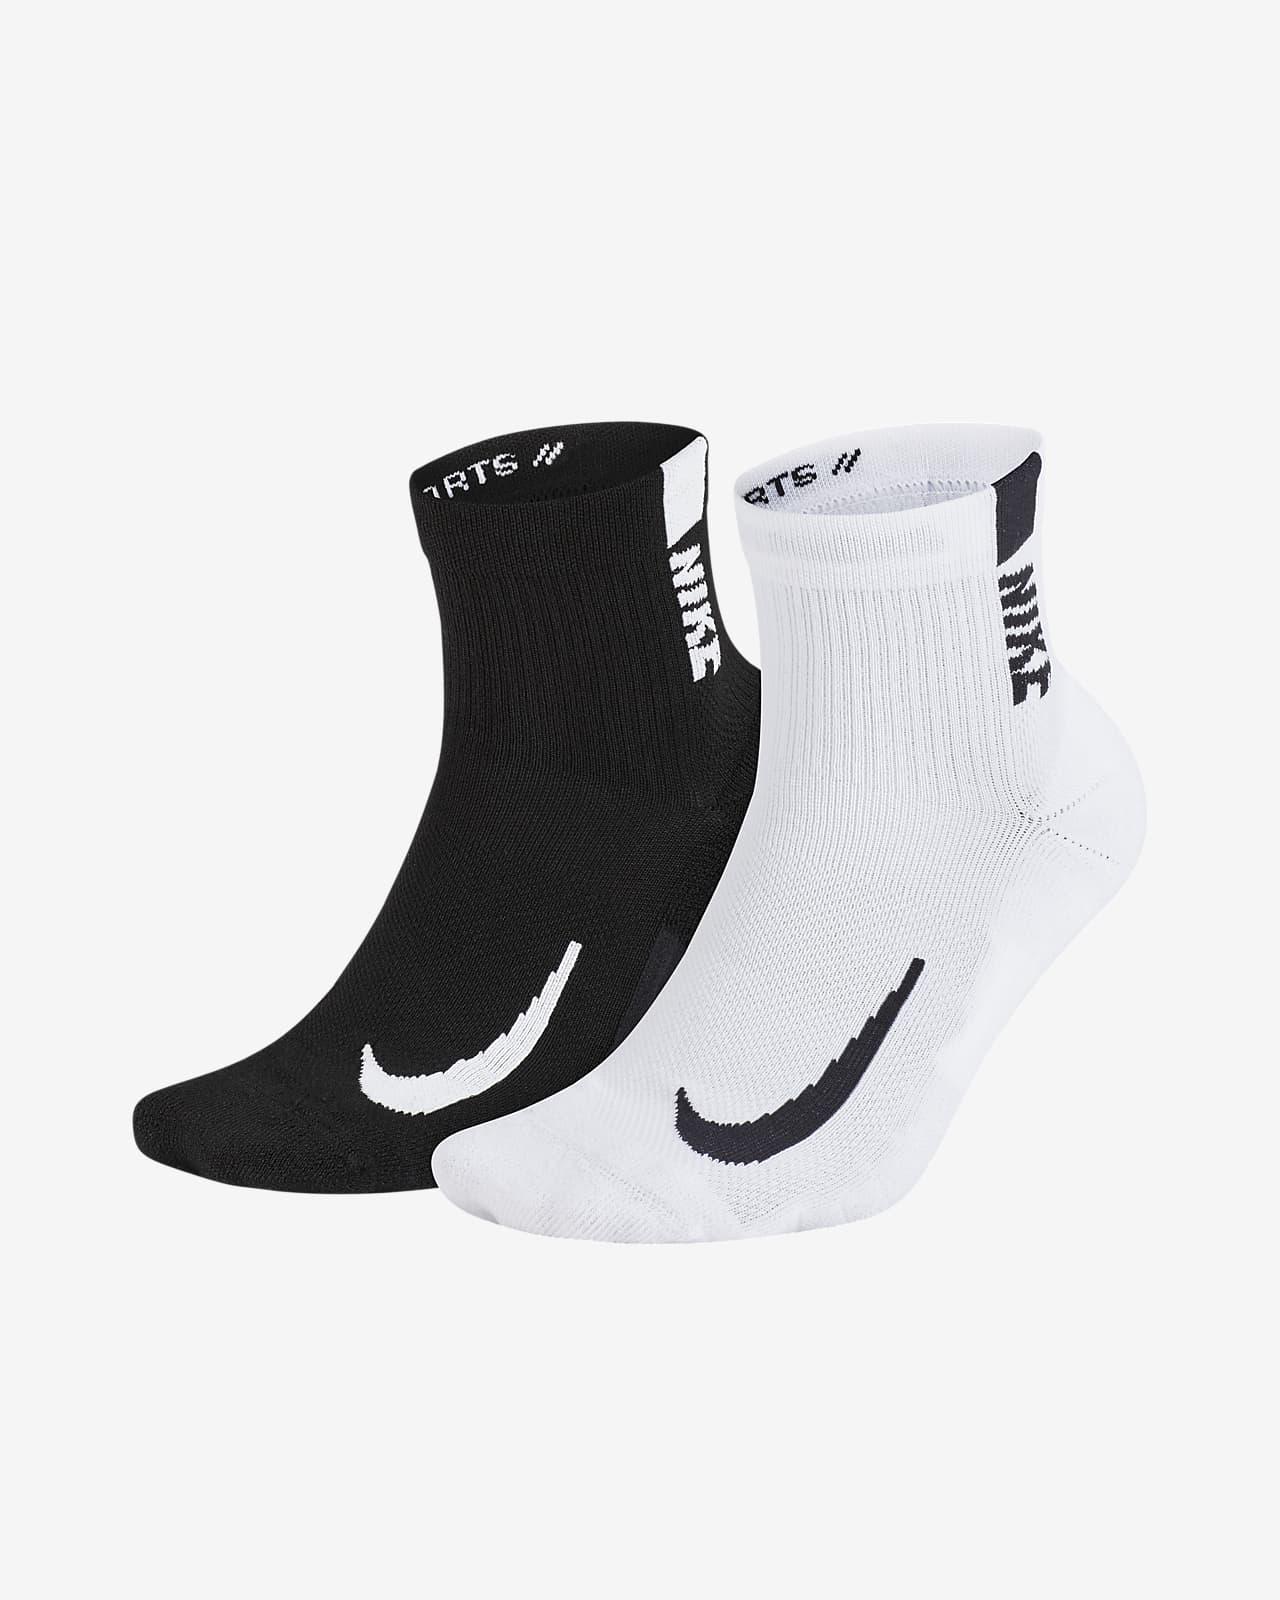 Socquettes Nike Multiplier (2 paires)